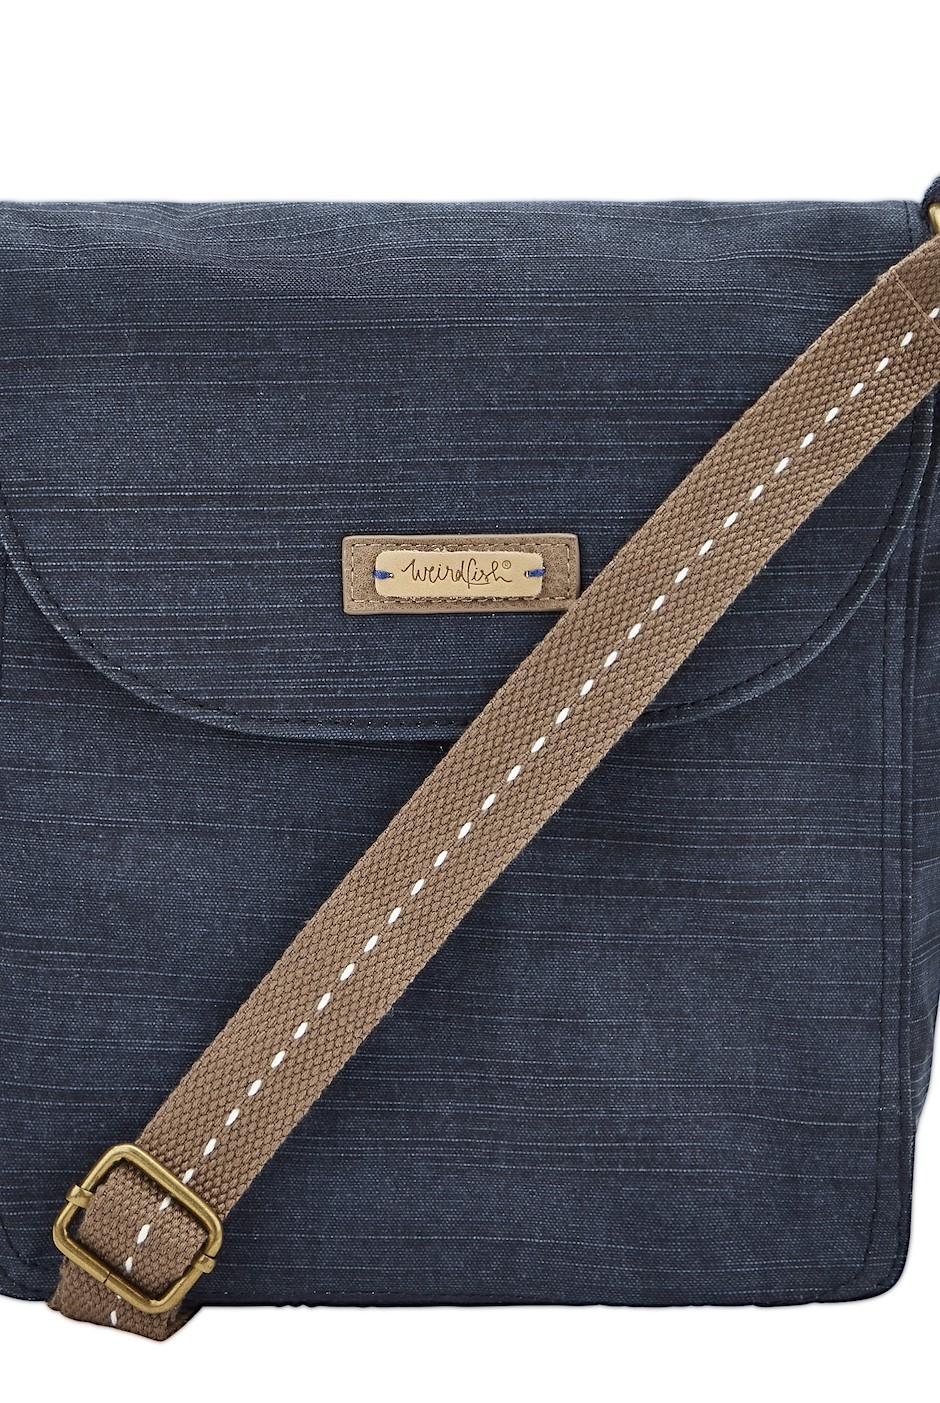 Loula Cotton Cross Body Bag Dark Navy